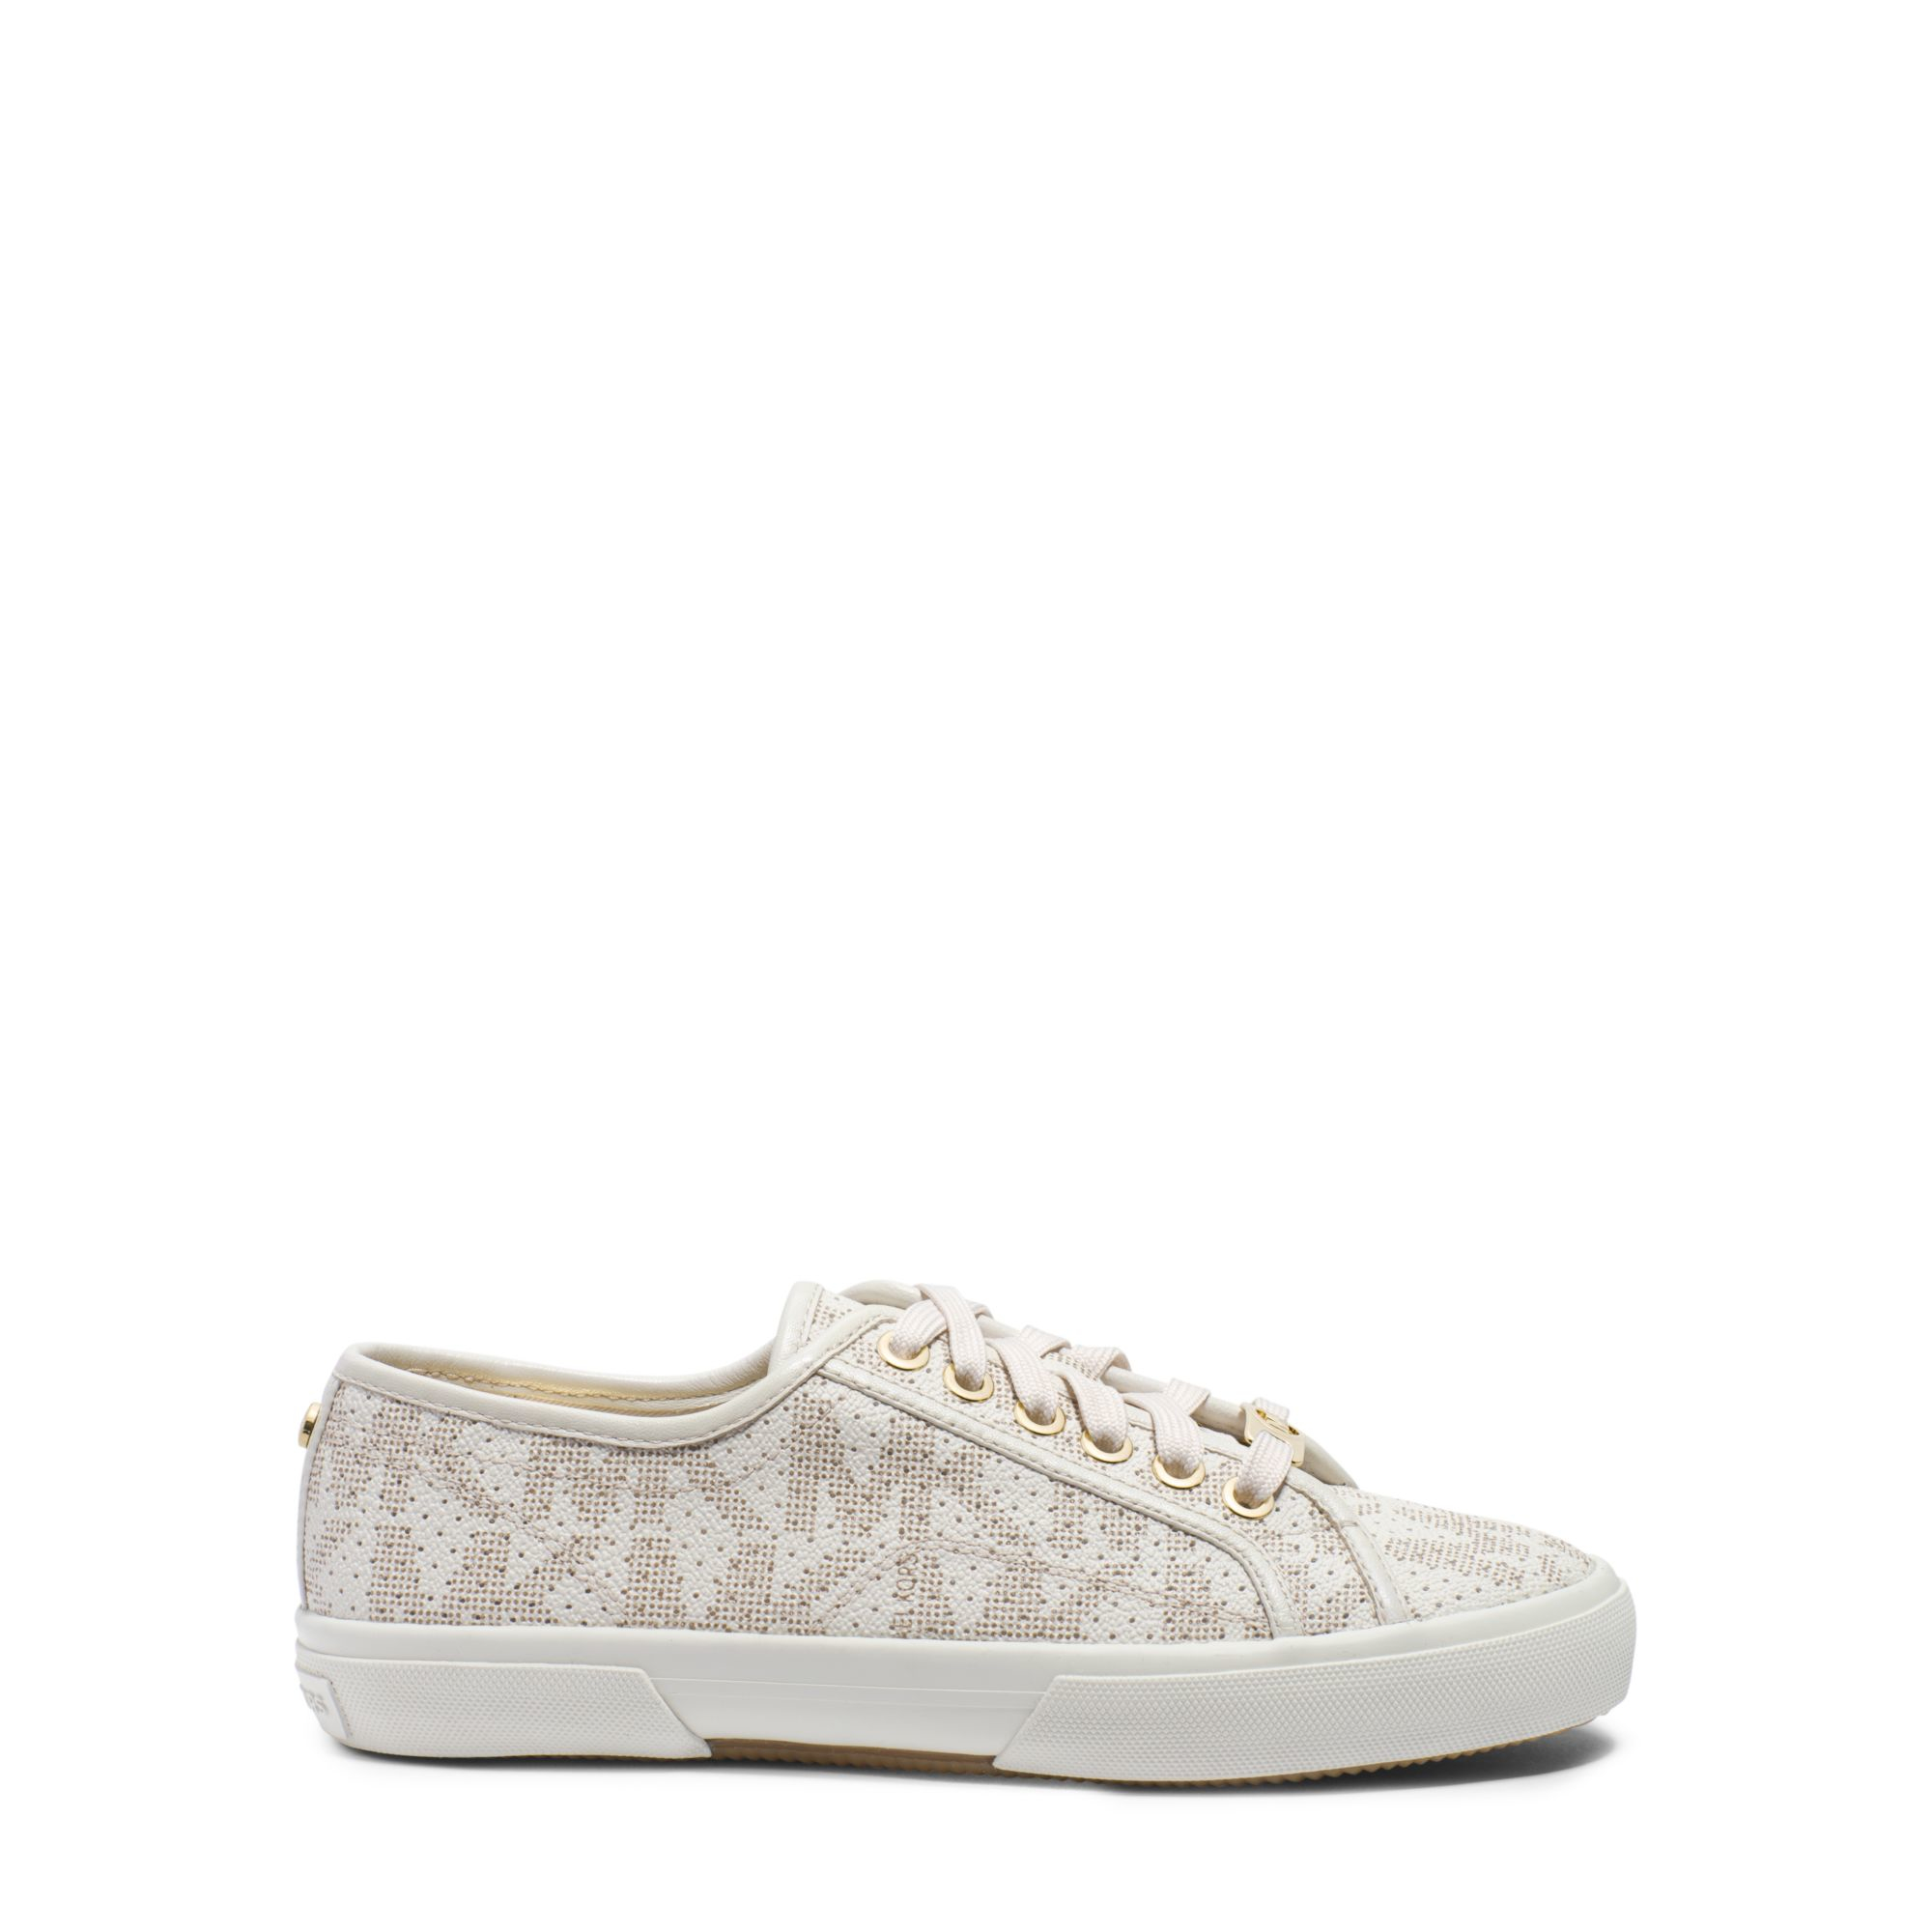 bb64f732fd84b Lyst - Michael Kors Boerum Logo Leather-trimmed Sneaker in White